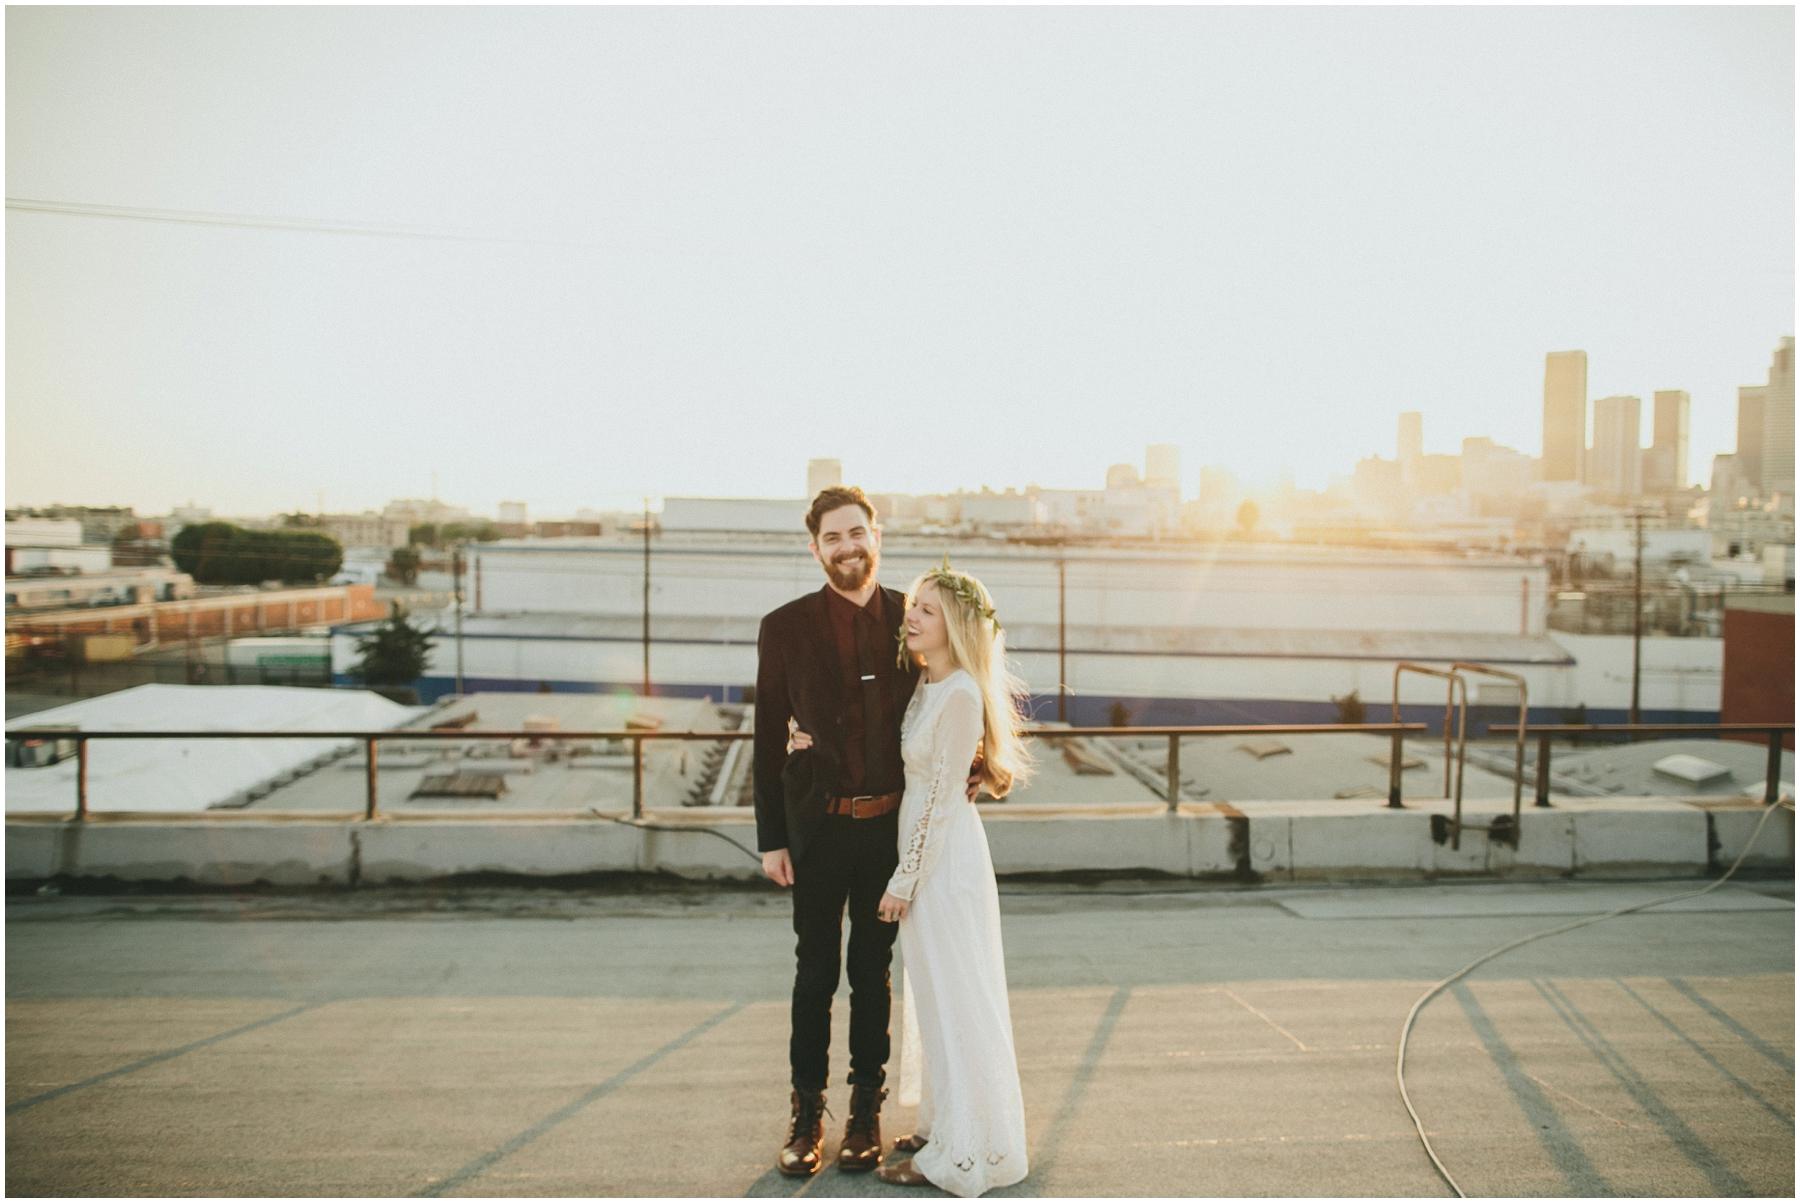 Natalie+Corey-WEDDING_KELLYBOITANO_0108